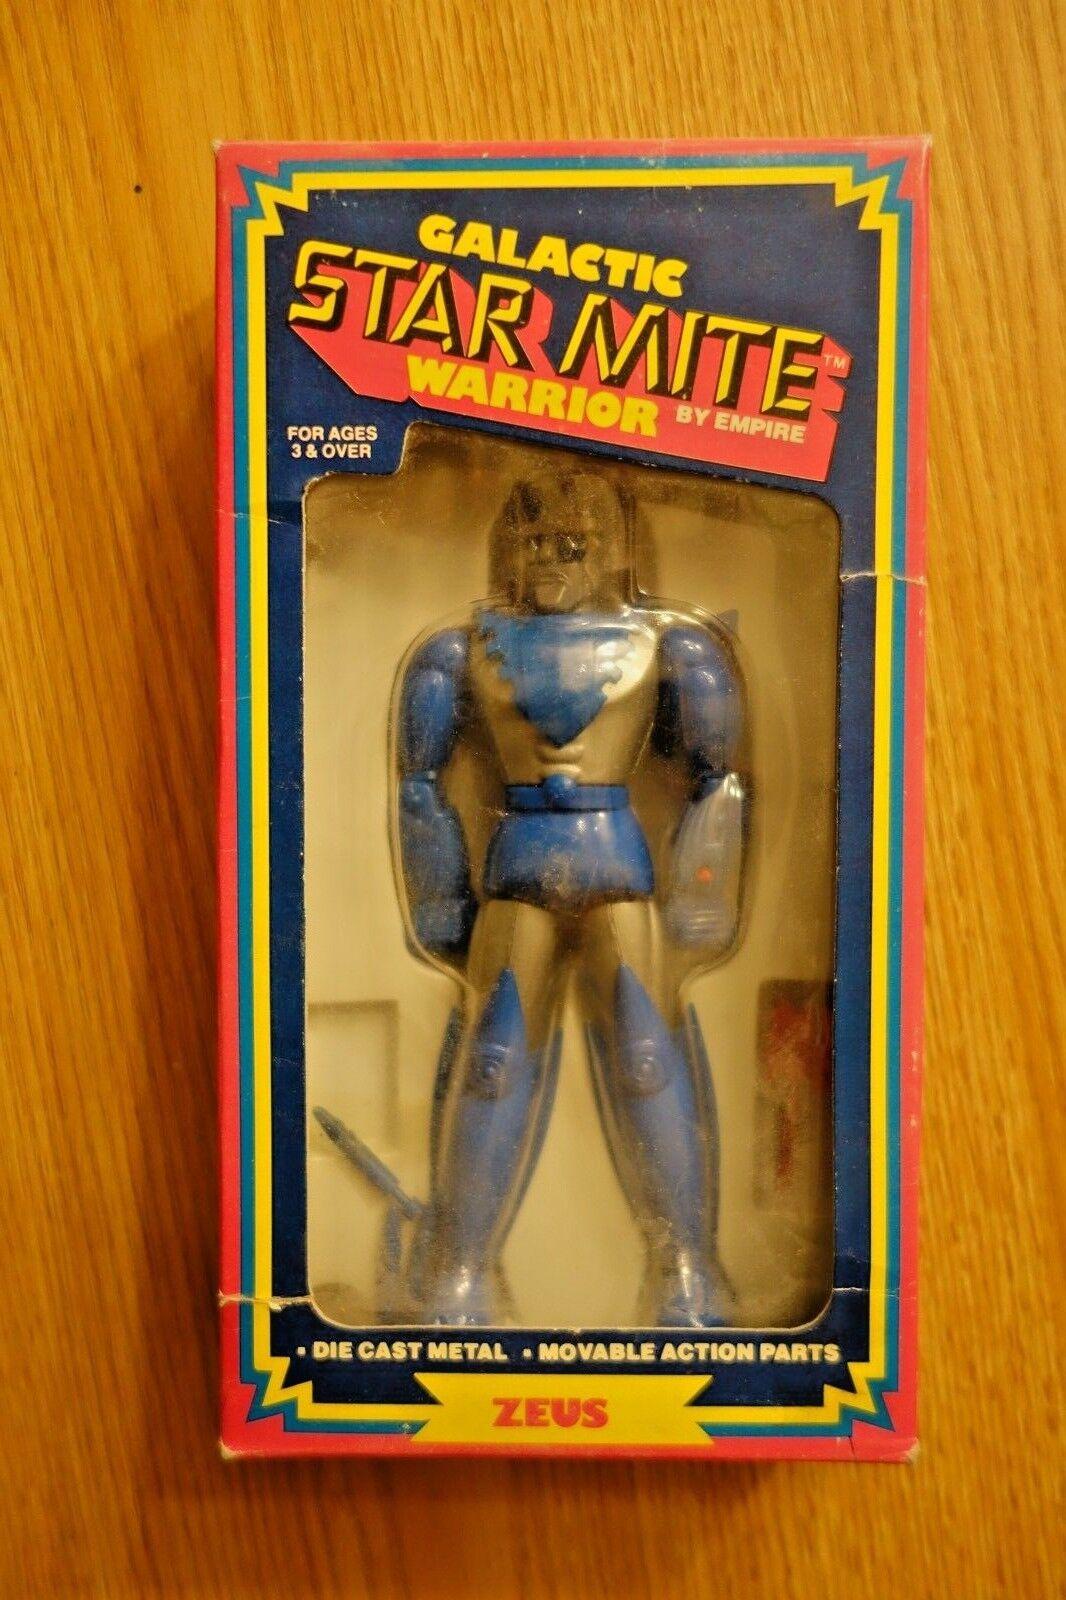 RARE   Vintage DieCast Galactic estrella Mite ZEUS Warrior Empire giocattoli  vendita economica